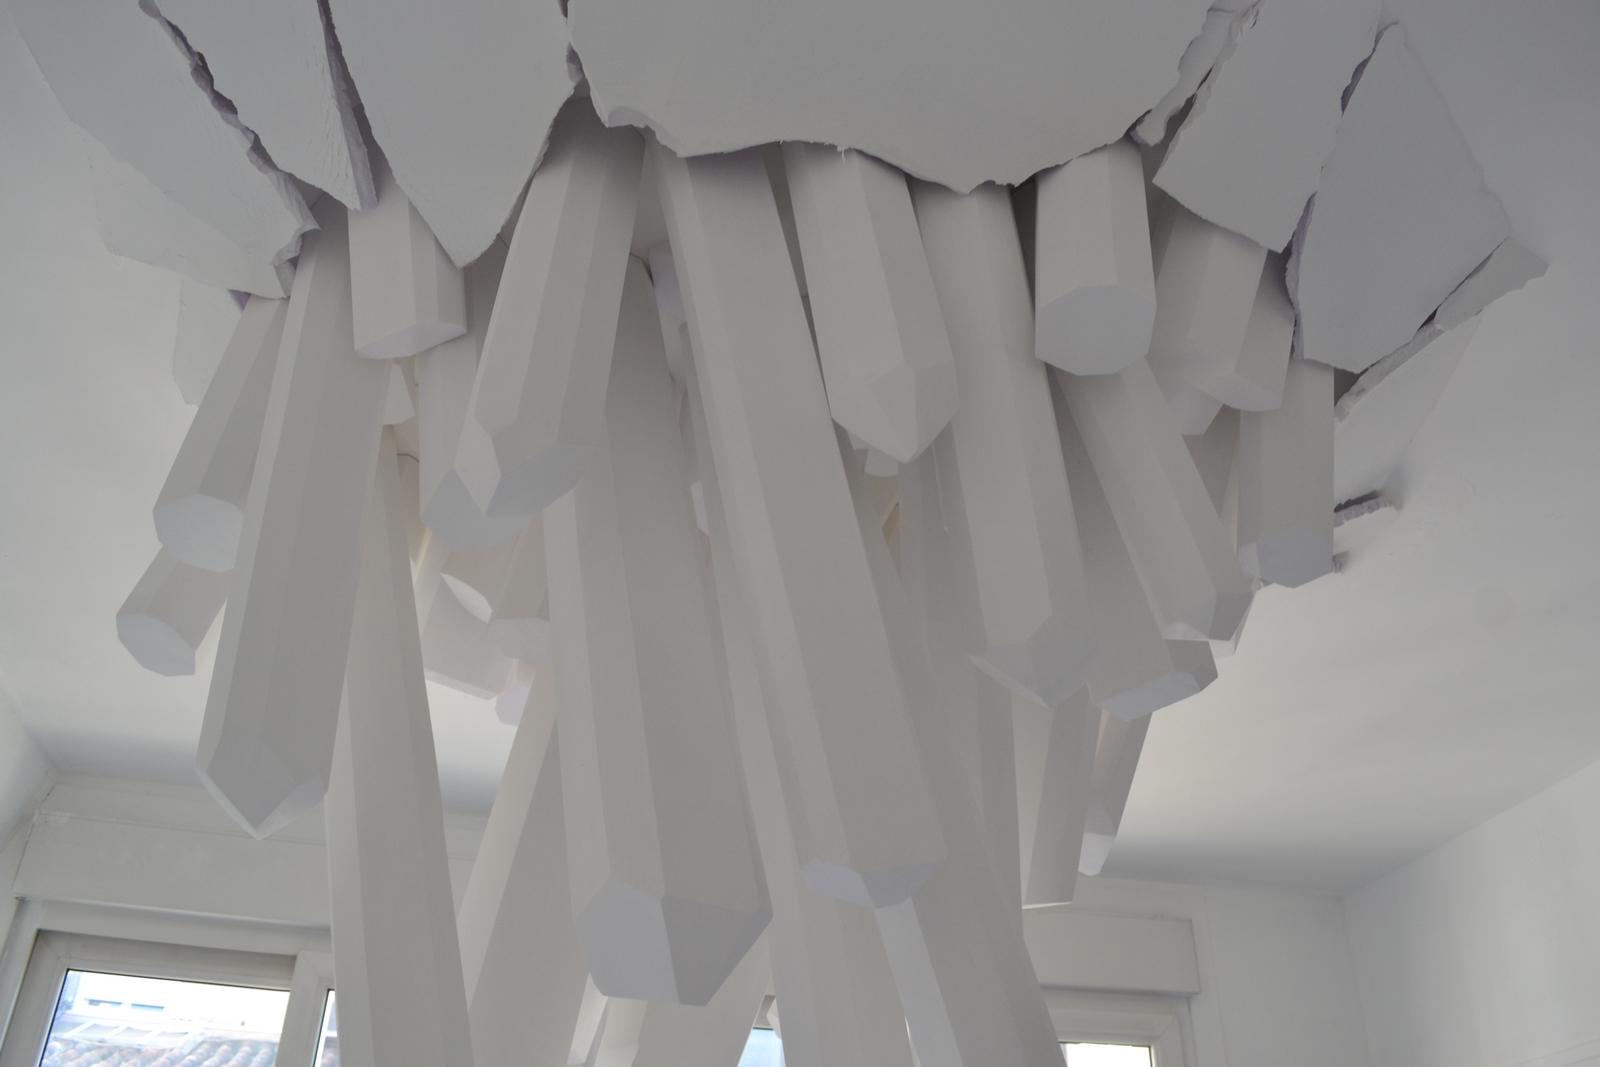 Installation de l'artiste Stéphane Parain. ©MD